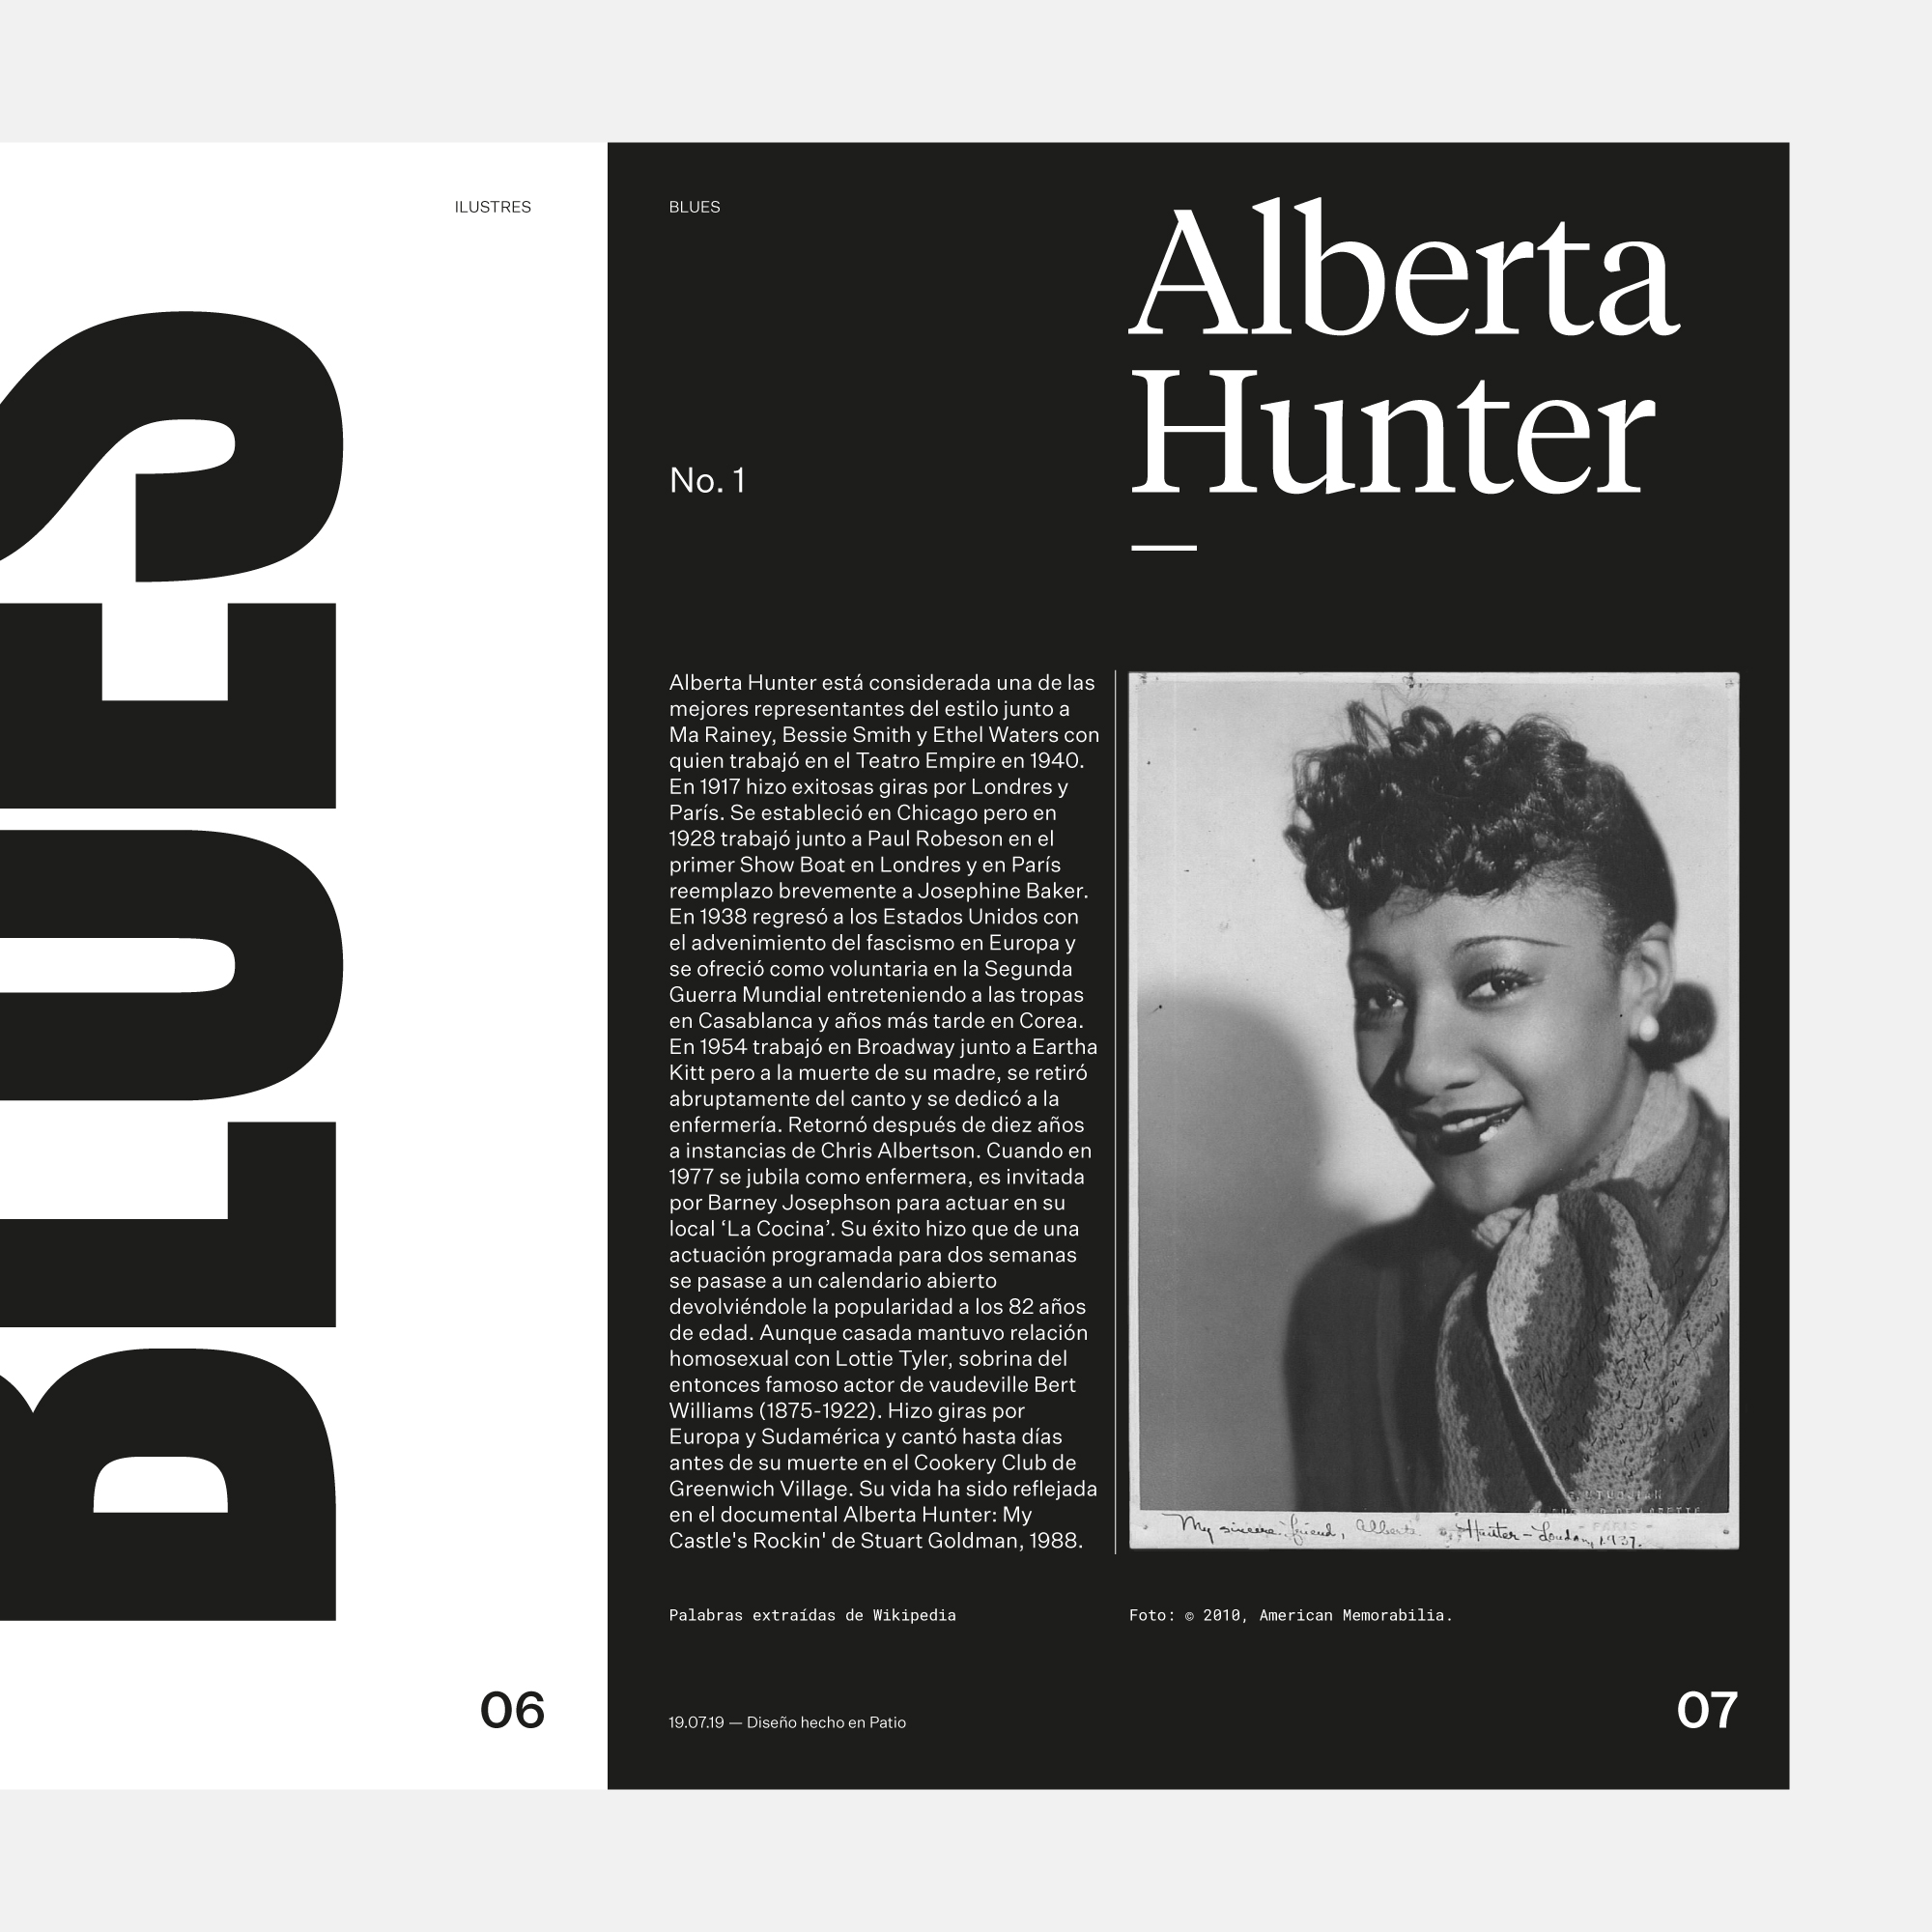 Patio_Alberta-Hunter